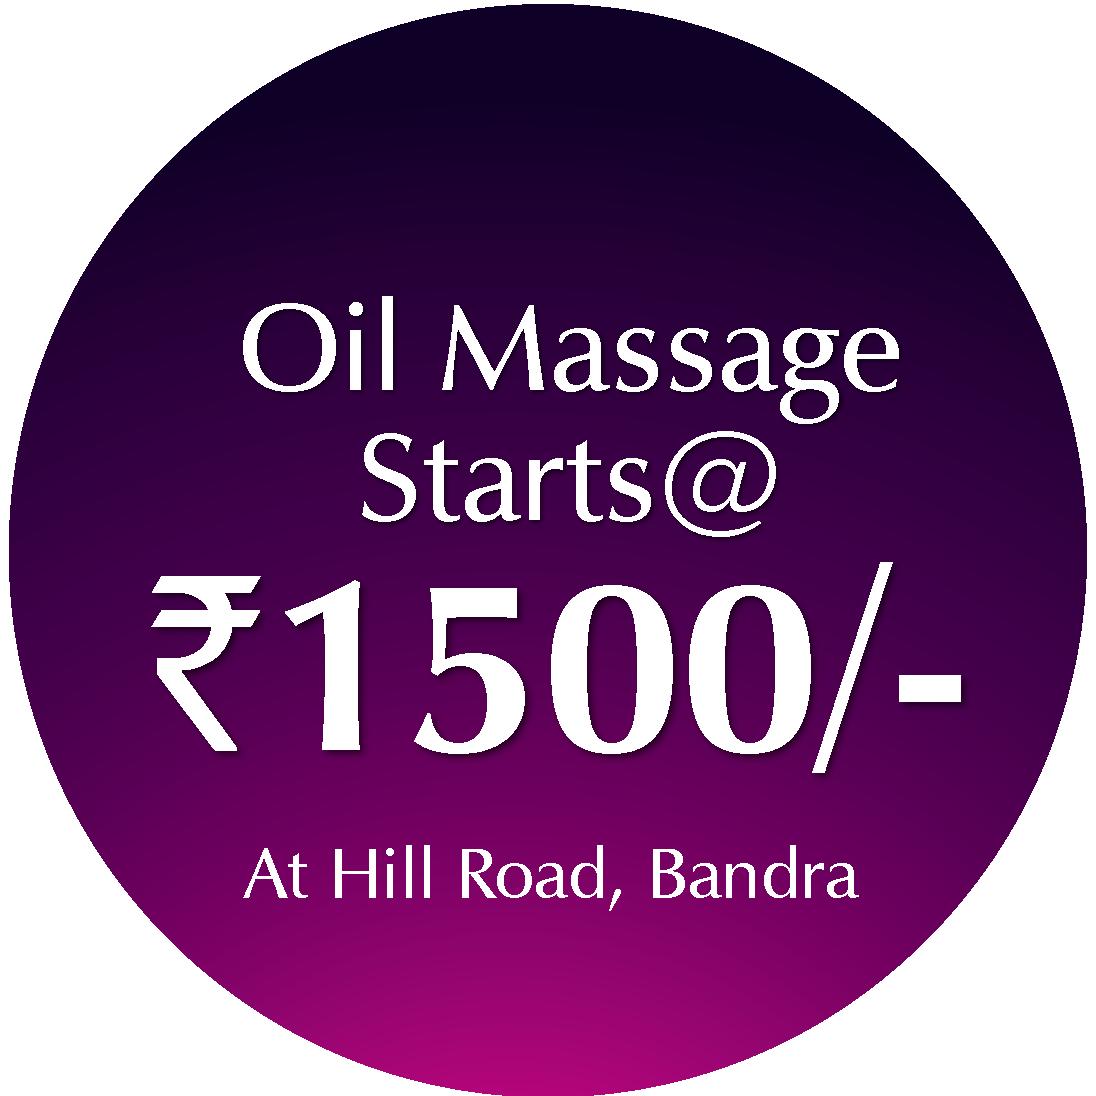 Oil Massage @ 1500